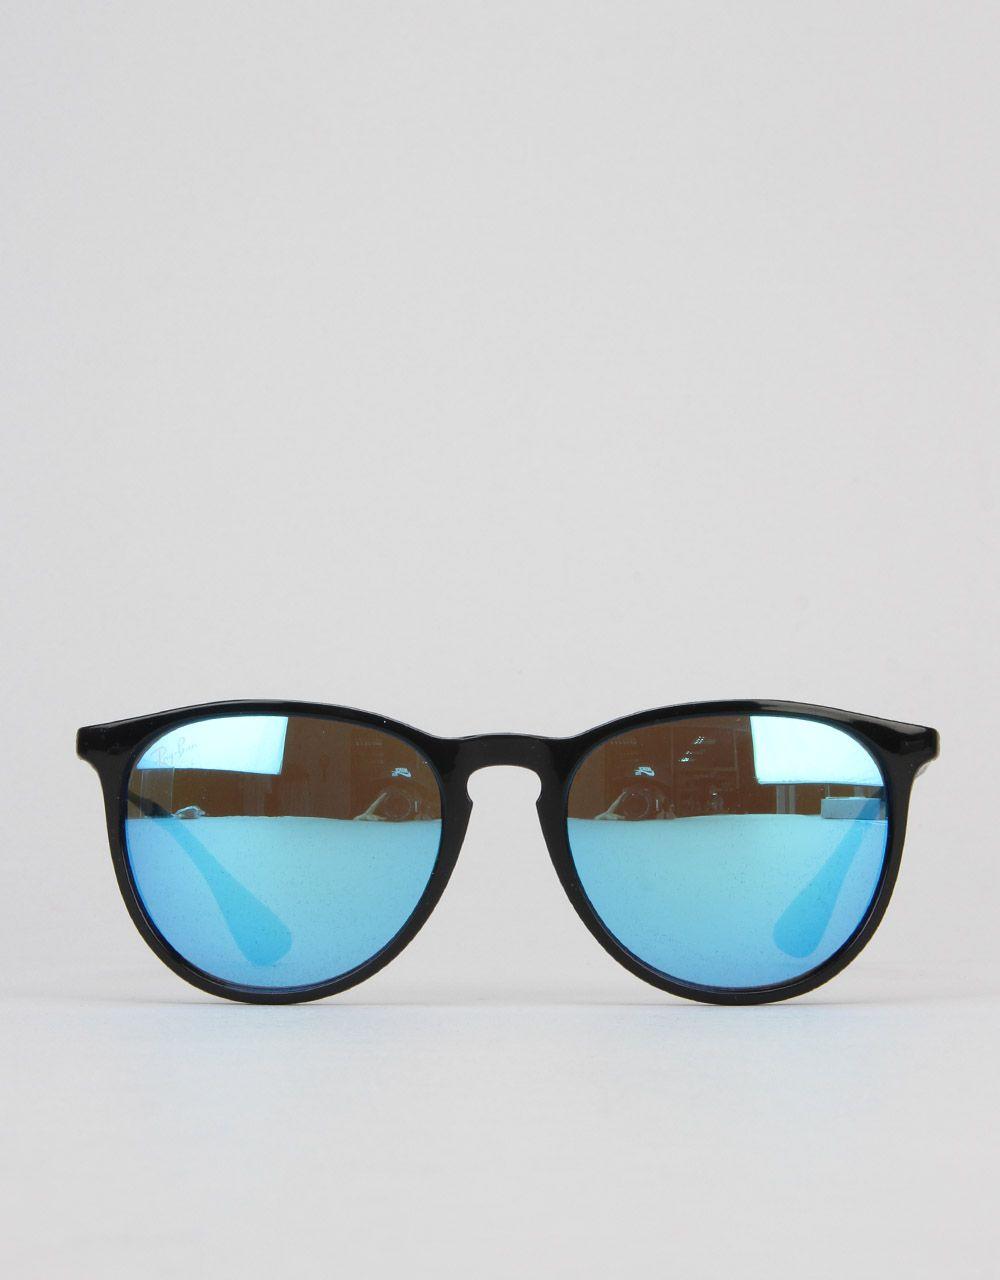 e75b45bdbbca7 Ray-Ban Erika Sunglasses - Black RB4171 601 55 54 - RouteOne.co.uk ...